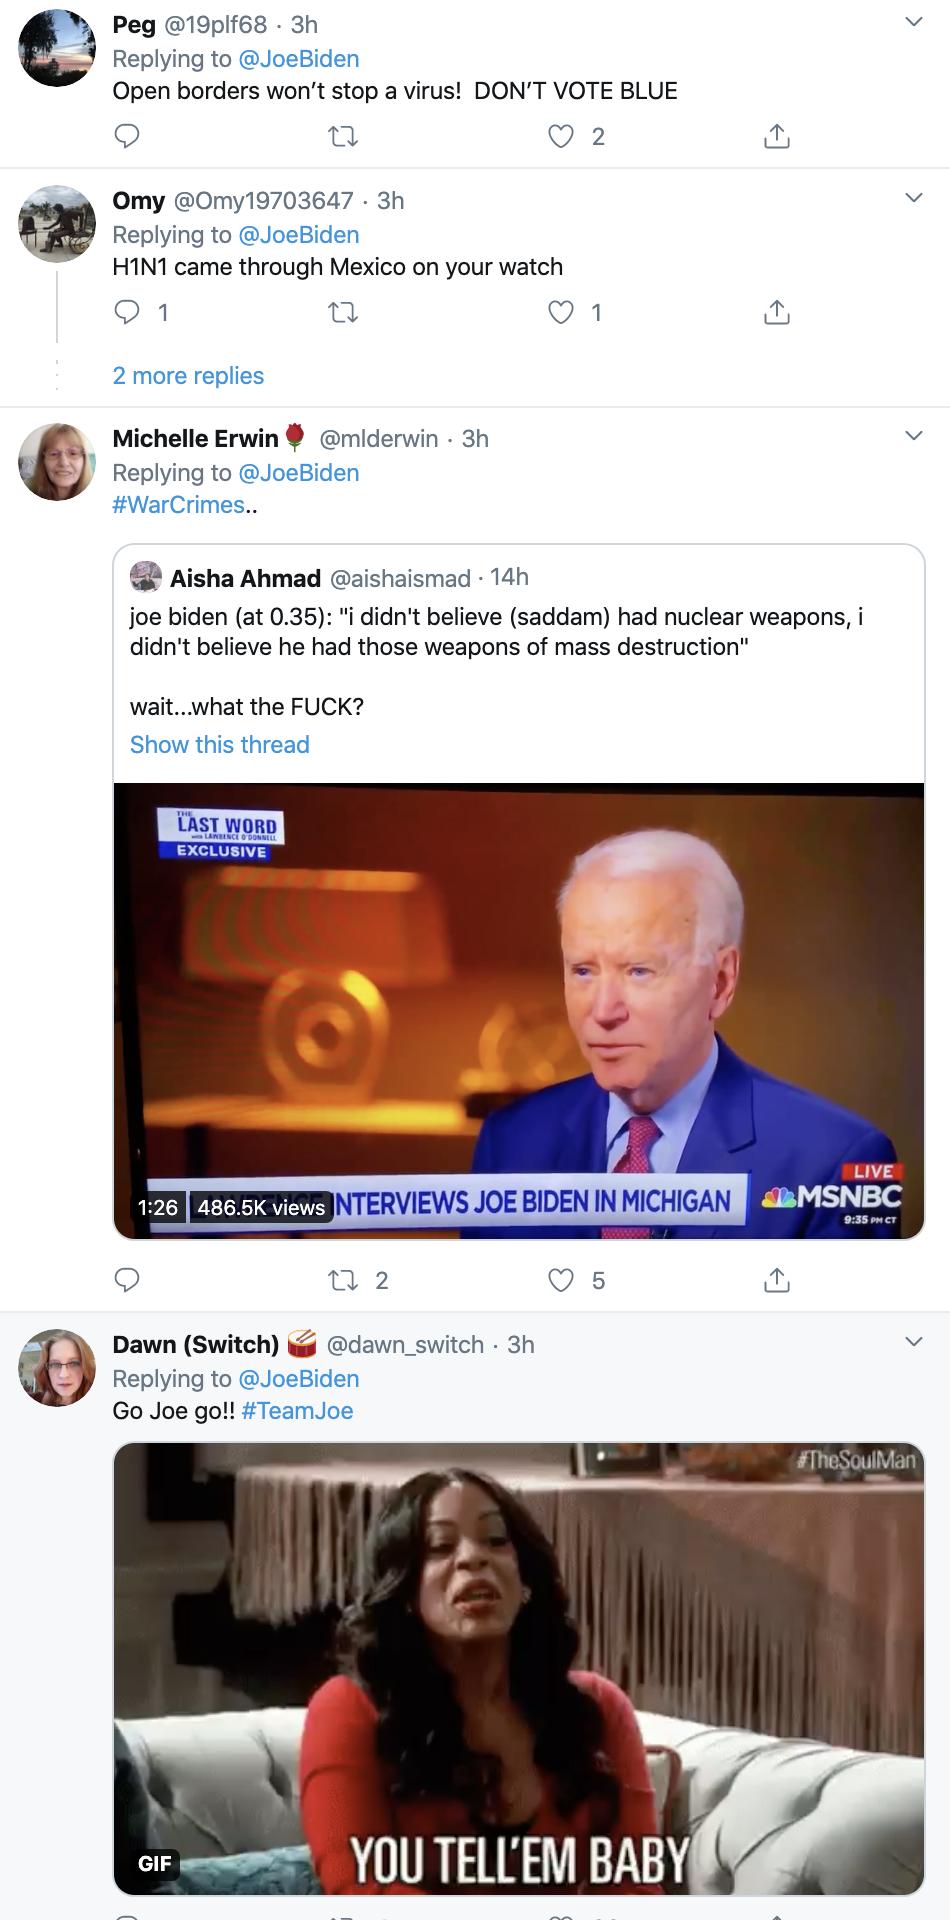 Screen-Shot-2020-03-10-at-12.40.17-PM Biden Trolls Trump Over Coronavirus & Goes Viral Fast Corruption Featured Healthcare Politics Top Stories